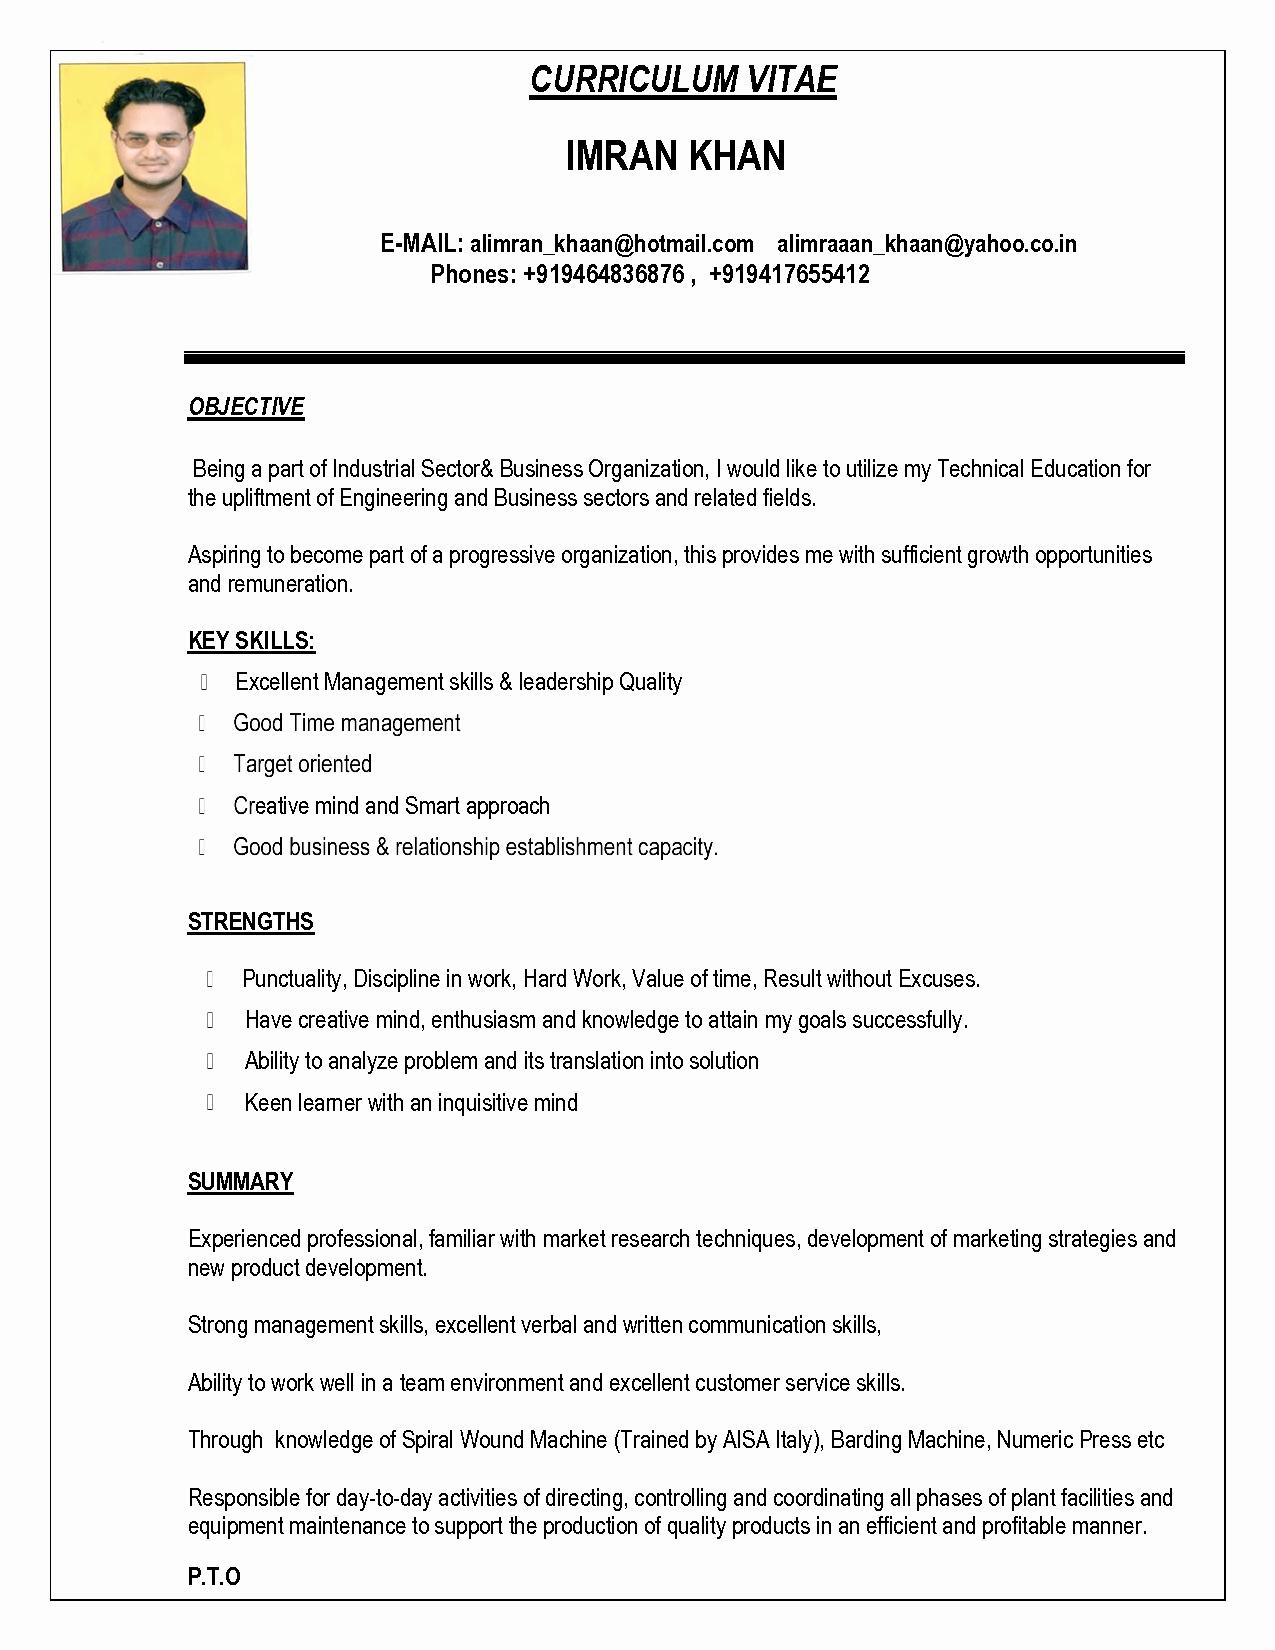 Sample Resume In Word format Inspirational Indian Resume format In Word File Free Download Bongdaao